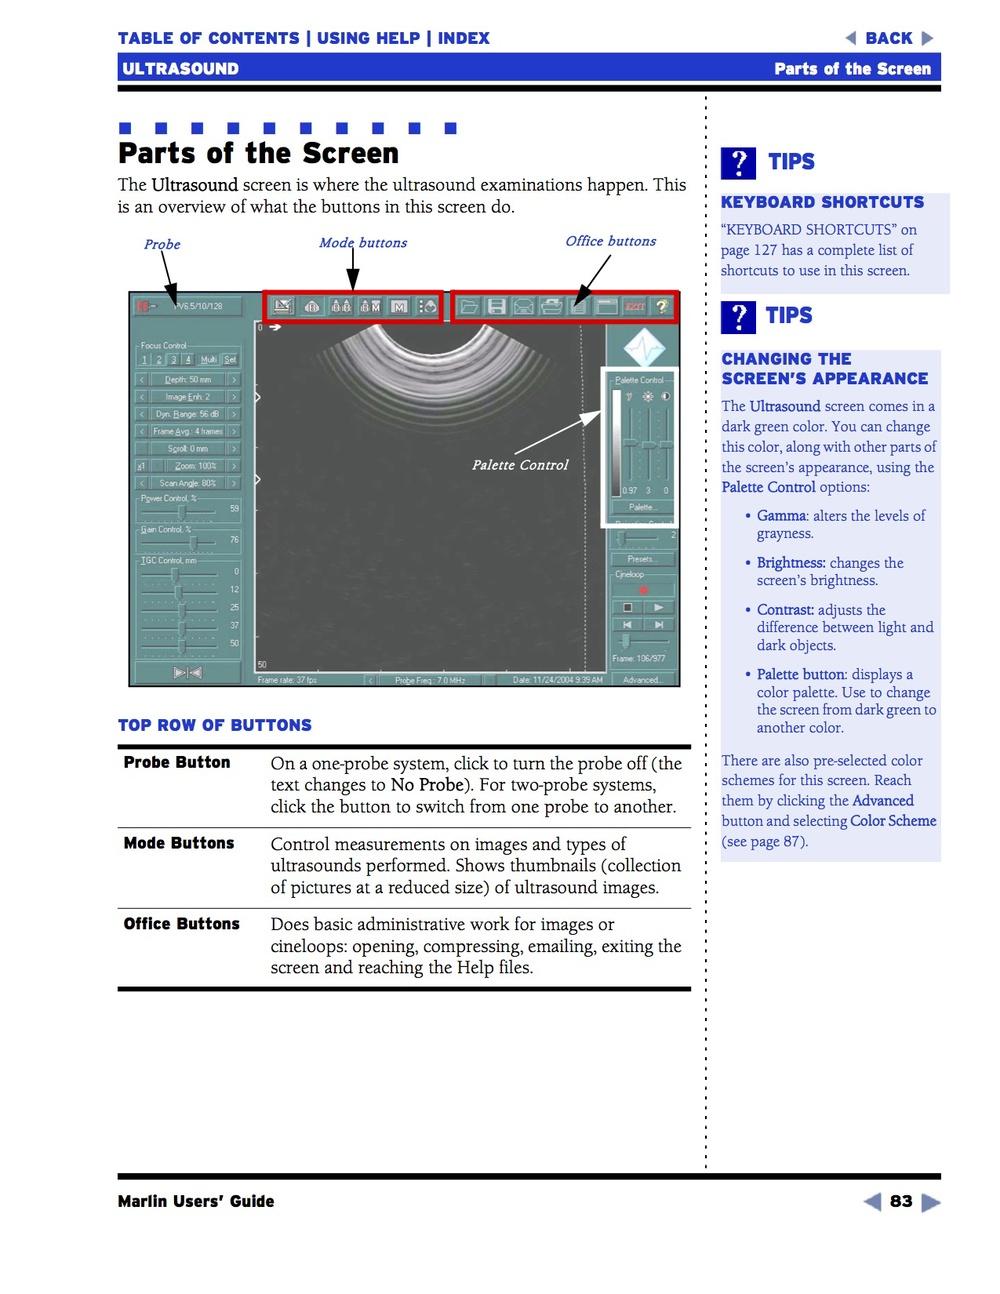 Telemedicine_Users_Guide11.jpg